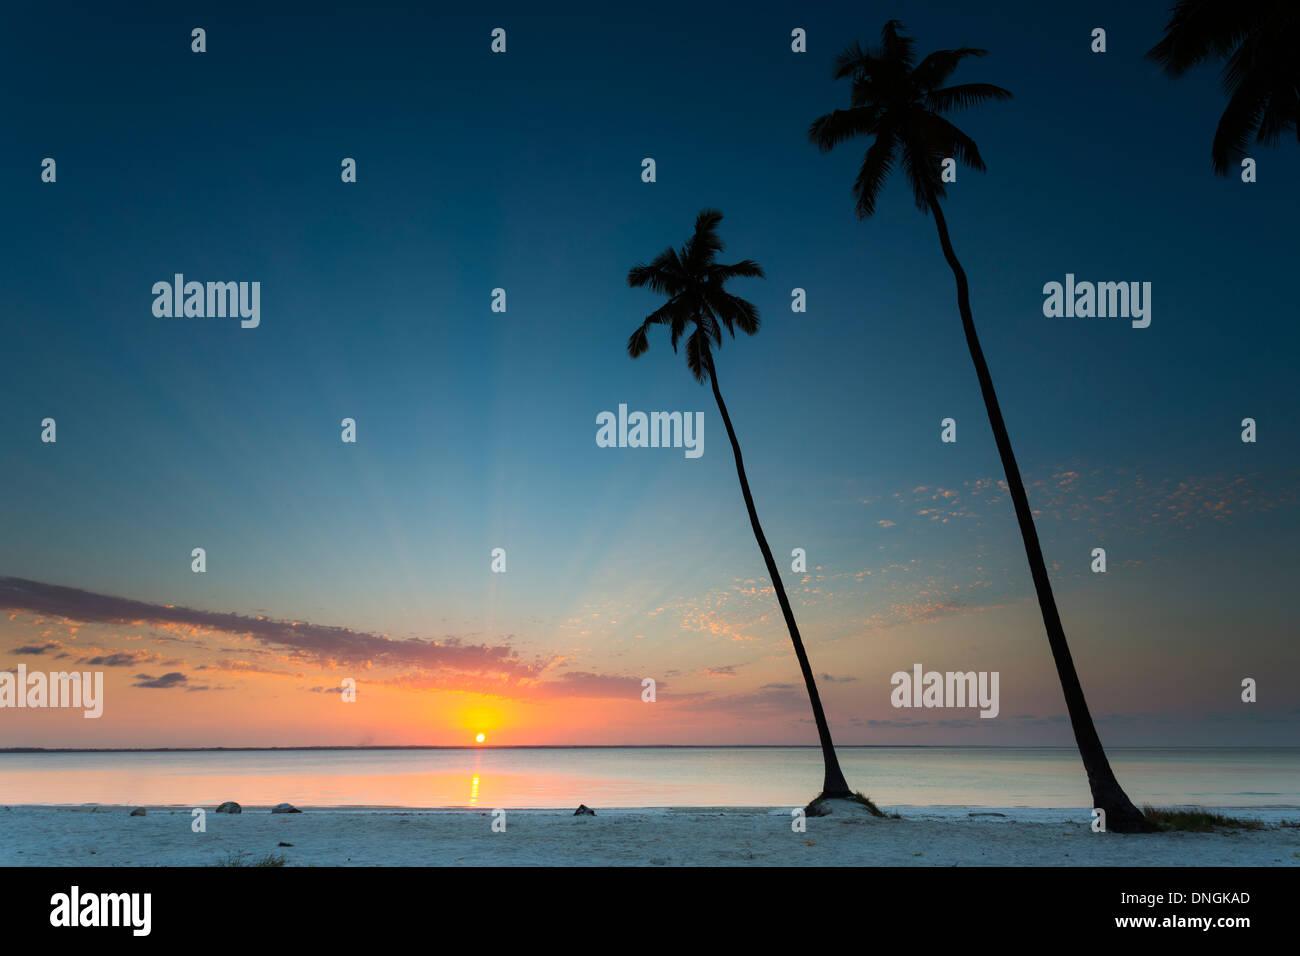 Palmen und Strand bei Sonnenuntergang in Sansibar, Tansania Stockbild